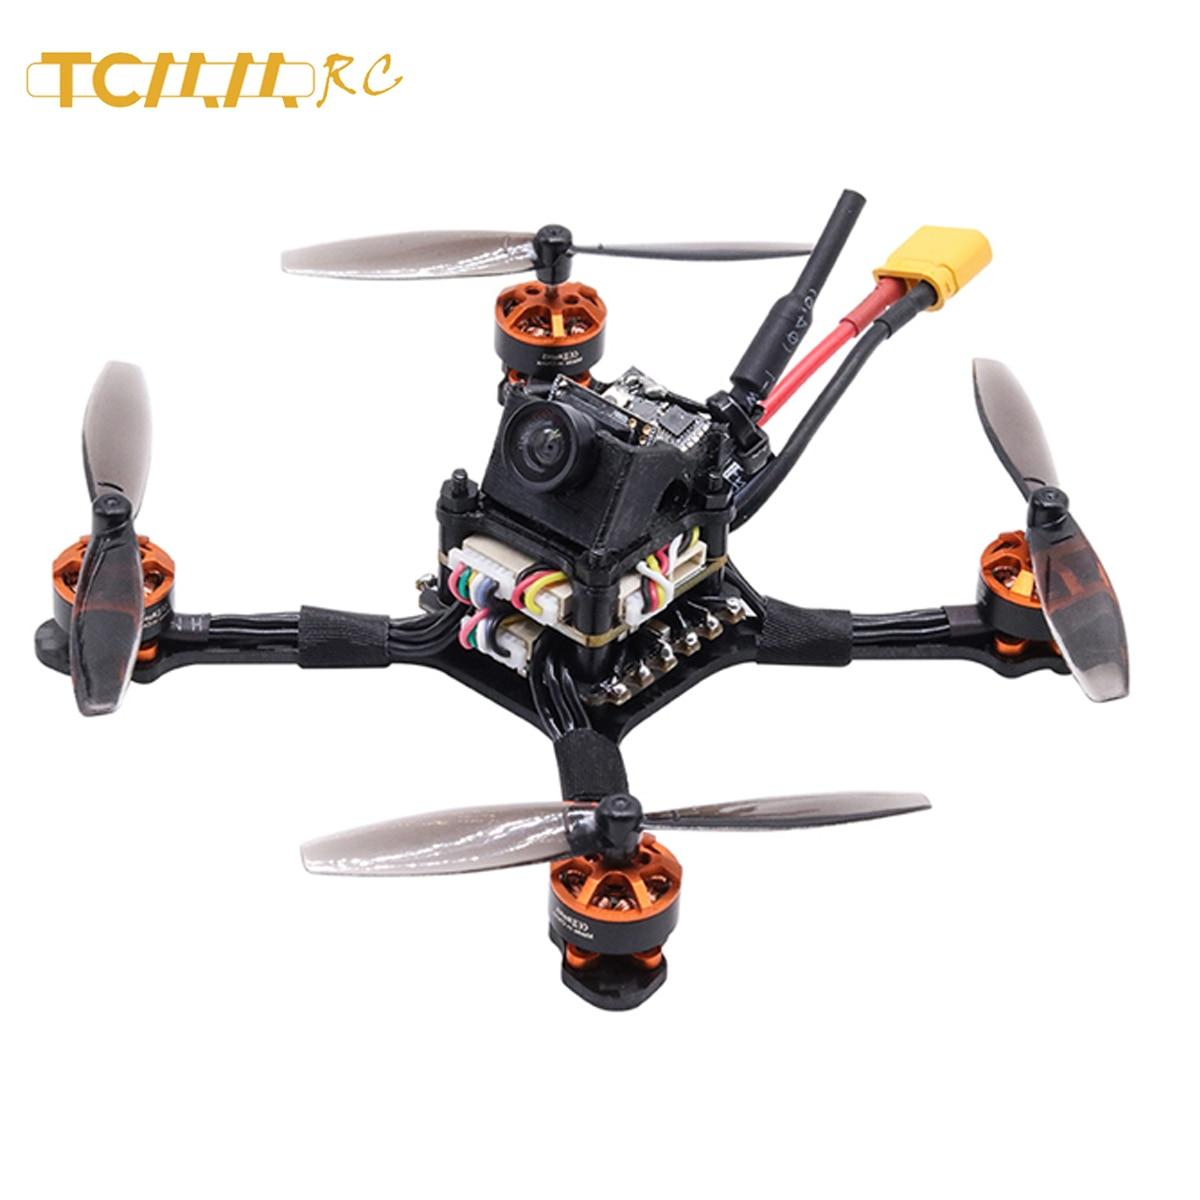 Tcmm rc 2.5 Inch Fpv Racing Drone 1104 motor 8600kv Carbon fiber high-thrust racing drone 1200TVL Camera Rc Helikopters